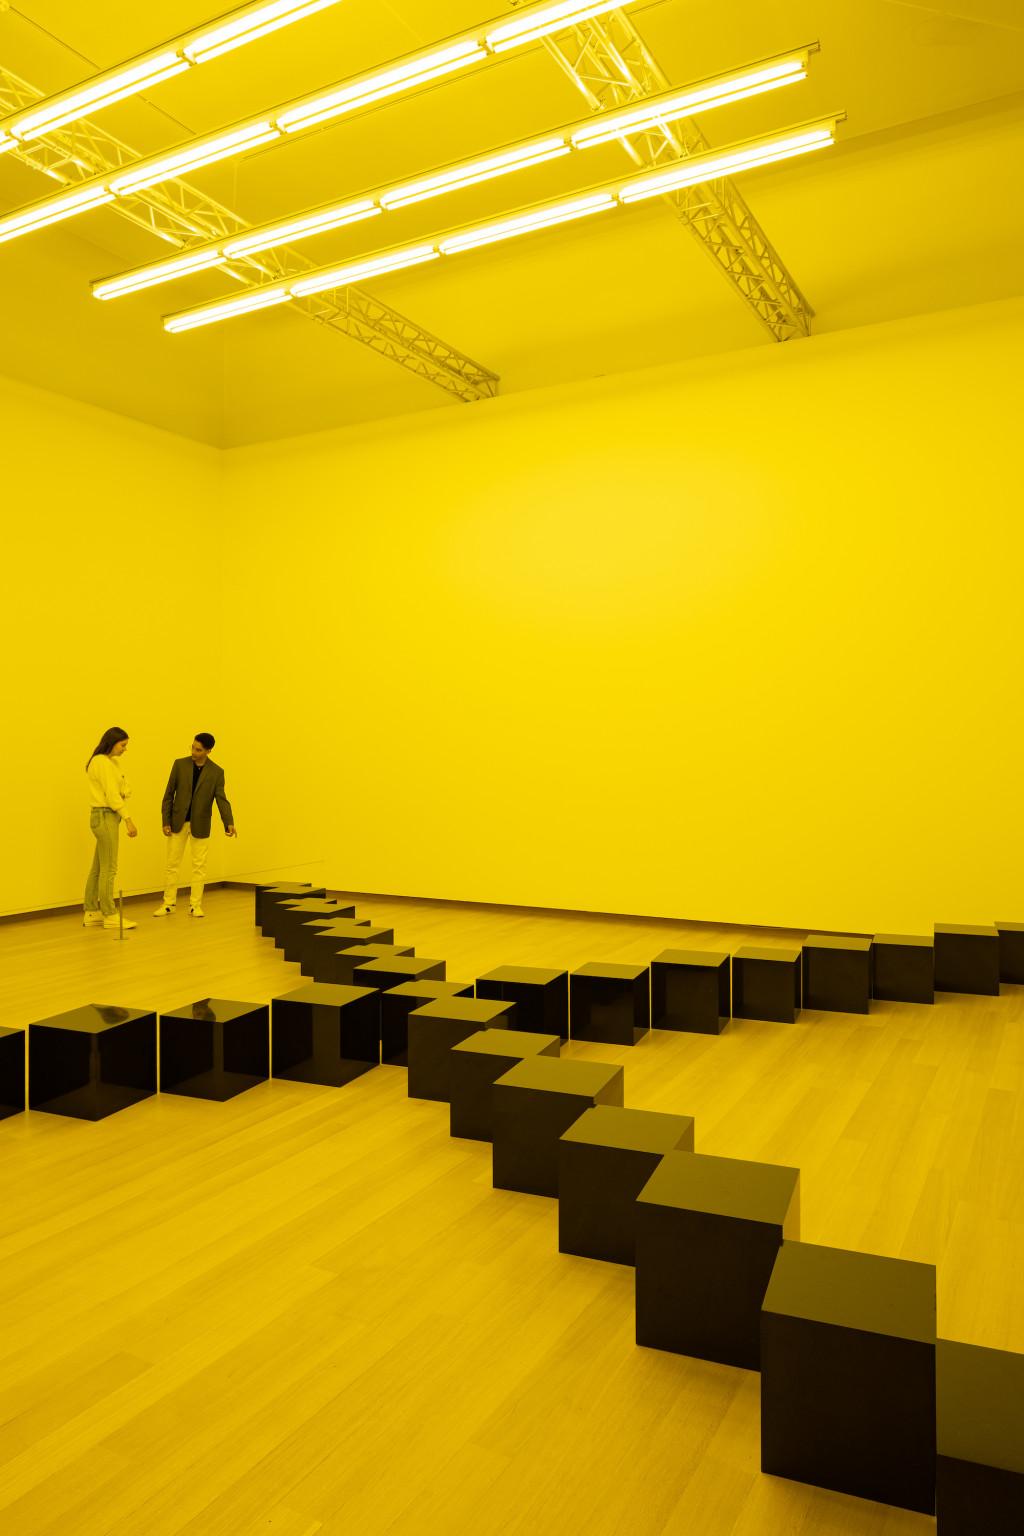 "Installation view. Bruce Nauman, Black Marble Under Yellow Light, 1987, coll. Fundacion ""la Caixa"", Barcelona. Photo: Peter Tijhuis © 2021 Bruce Nauman / Pictoright Amsterdam"